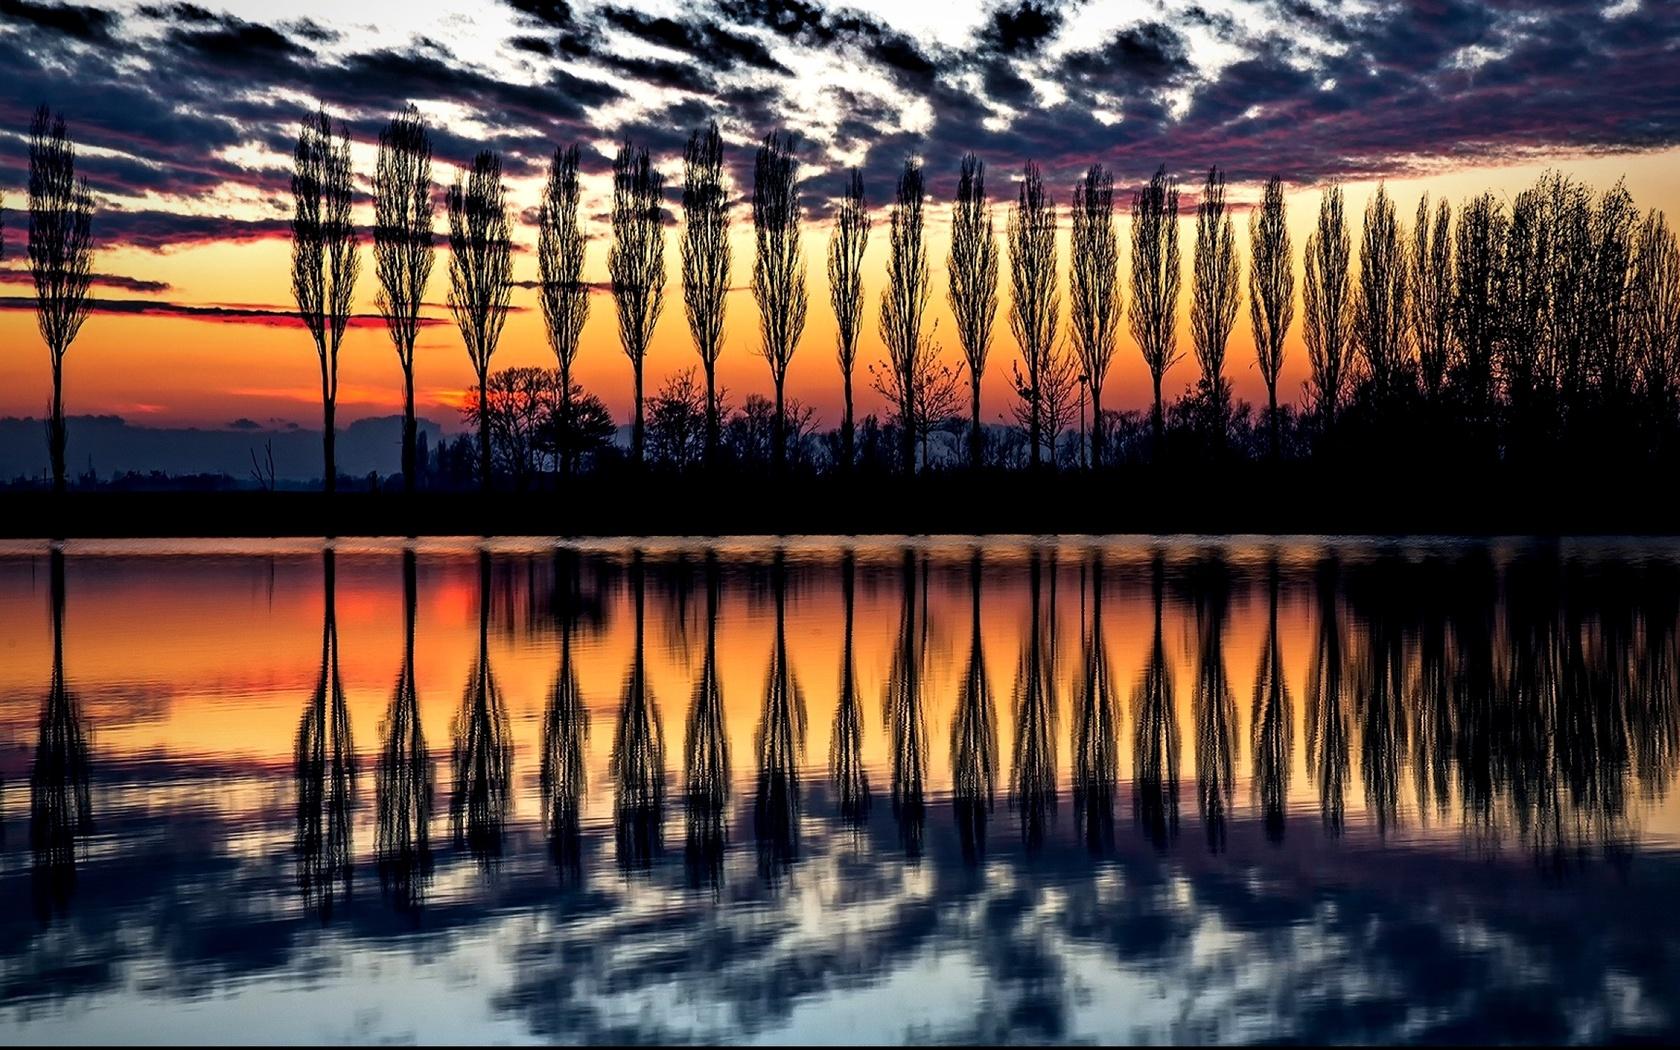 деревья, облака, италия.закат, вода, отображение, симметрия